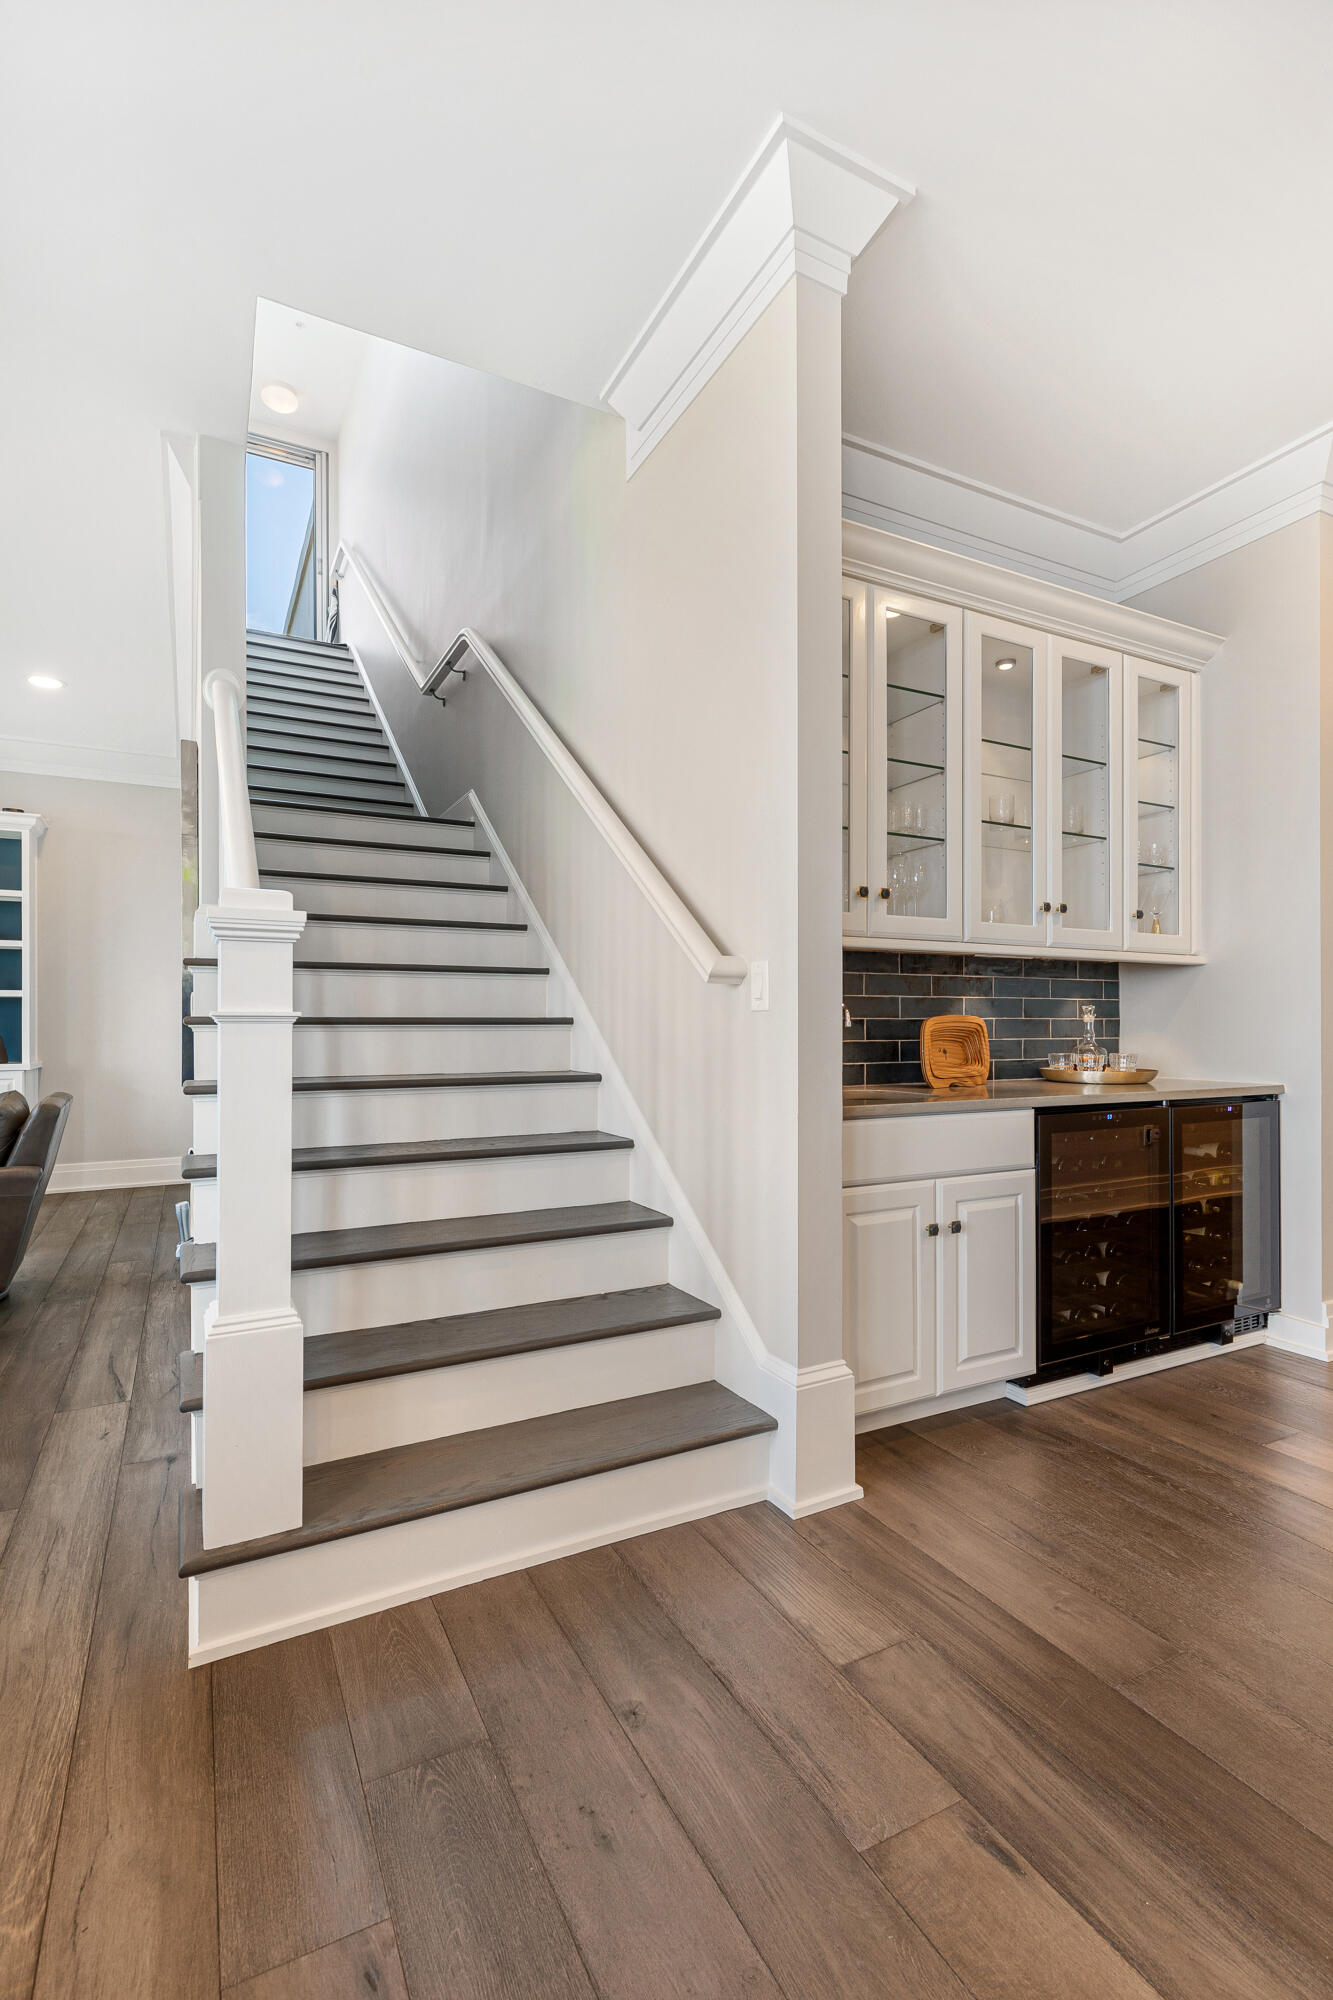 Tides Condominiums Homes For Sale - 367 Cooper River, Mount Pleasant, SC - 44